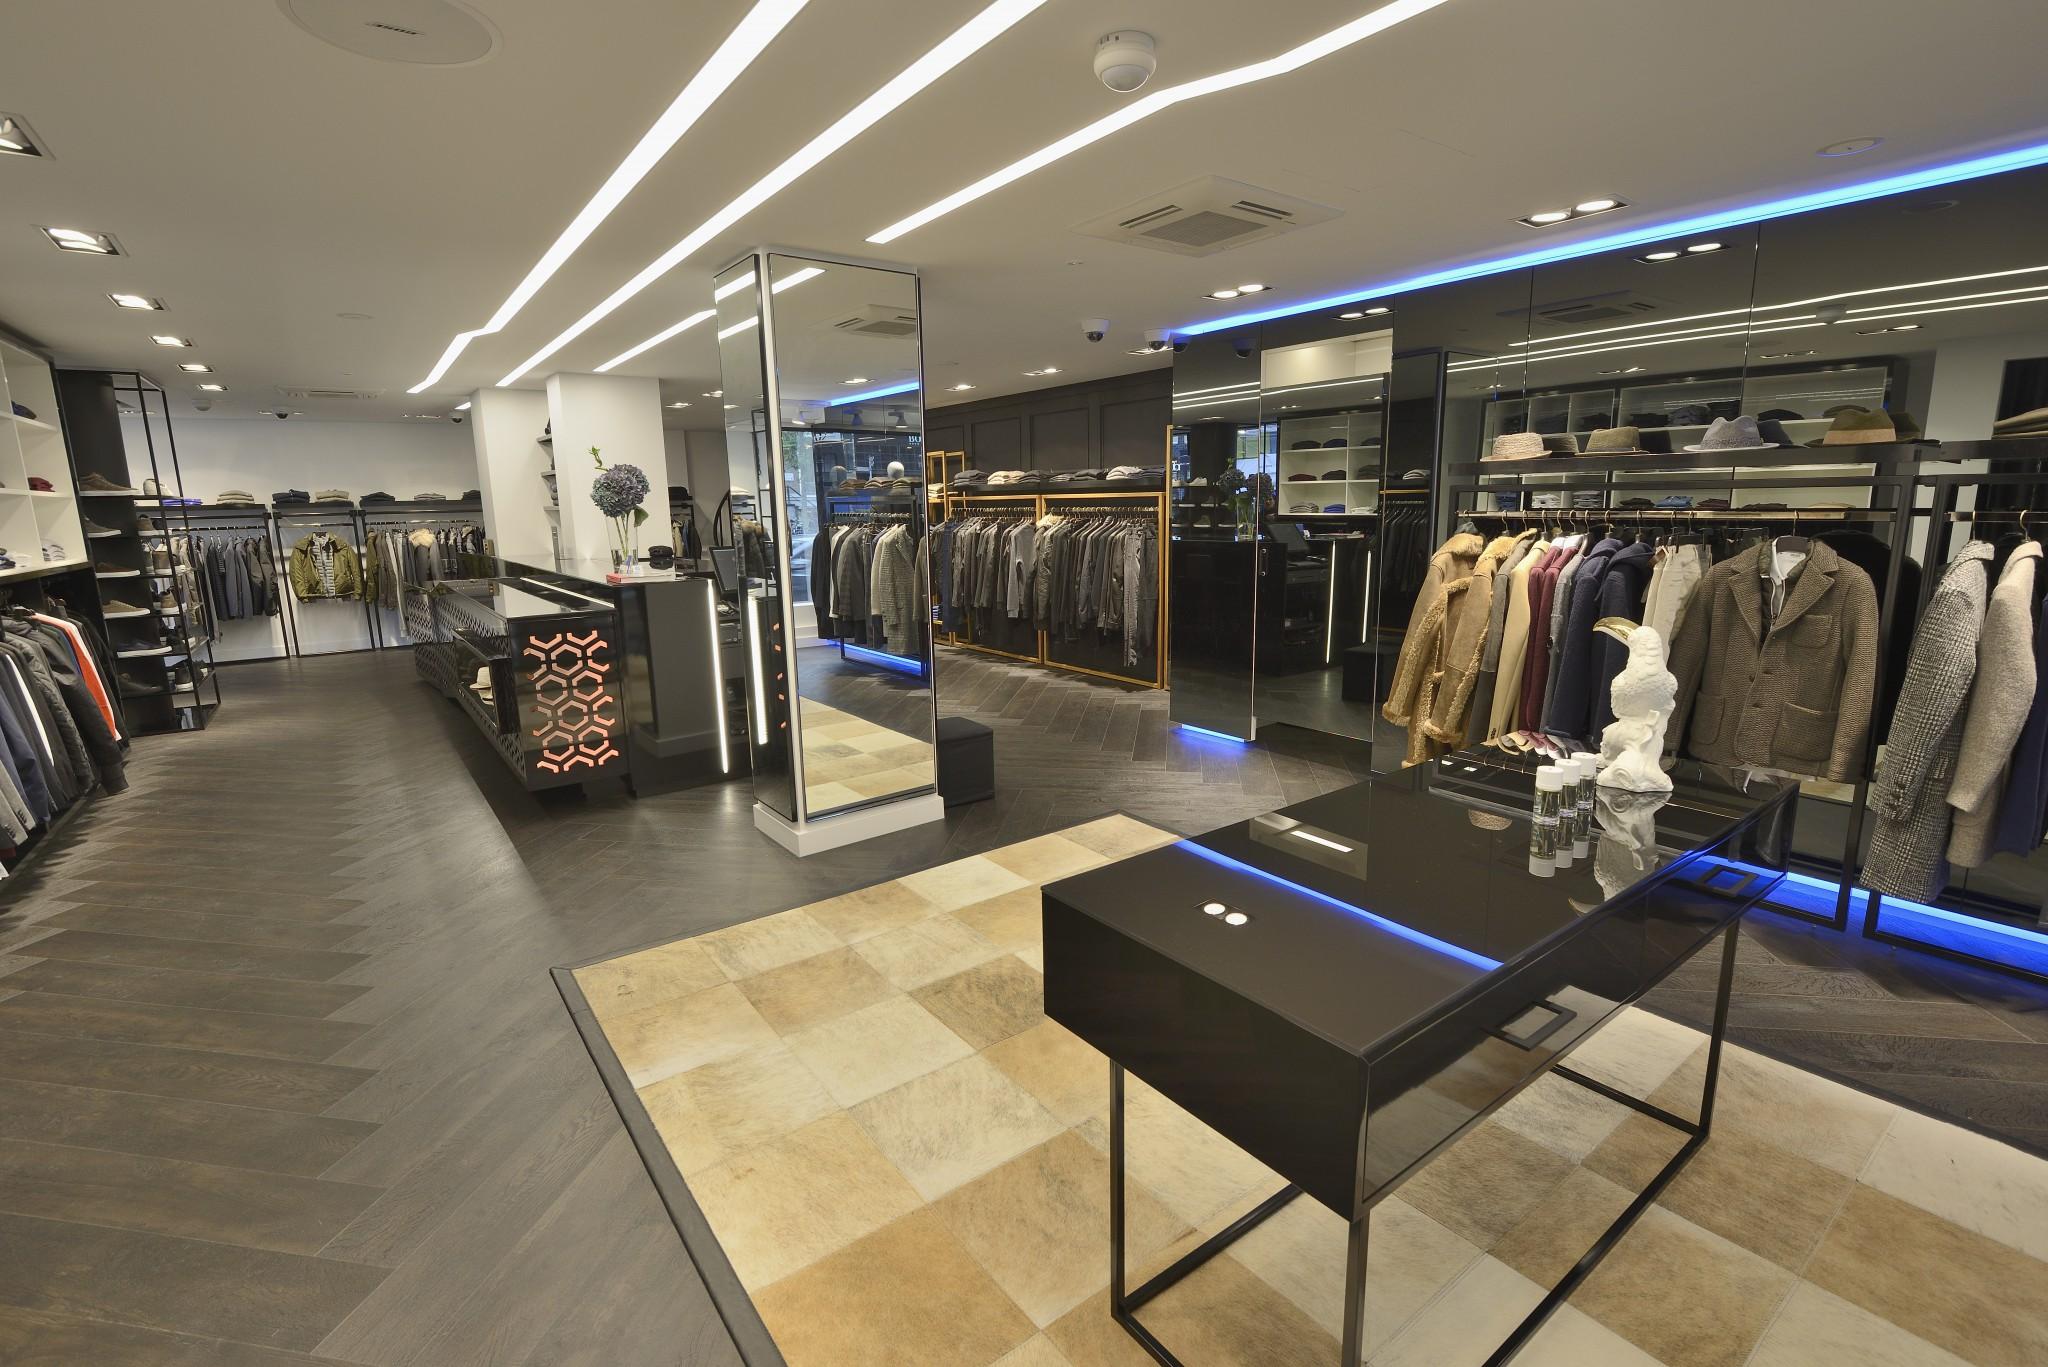 Sneak preview kingsquere op koningsplein in amsterdam for Interieur winkel amsterdam